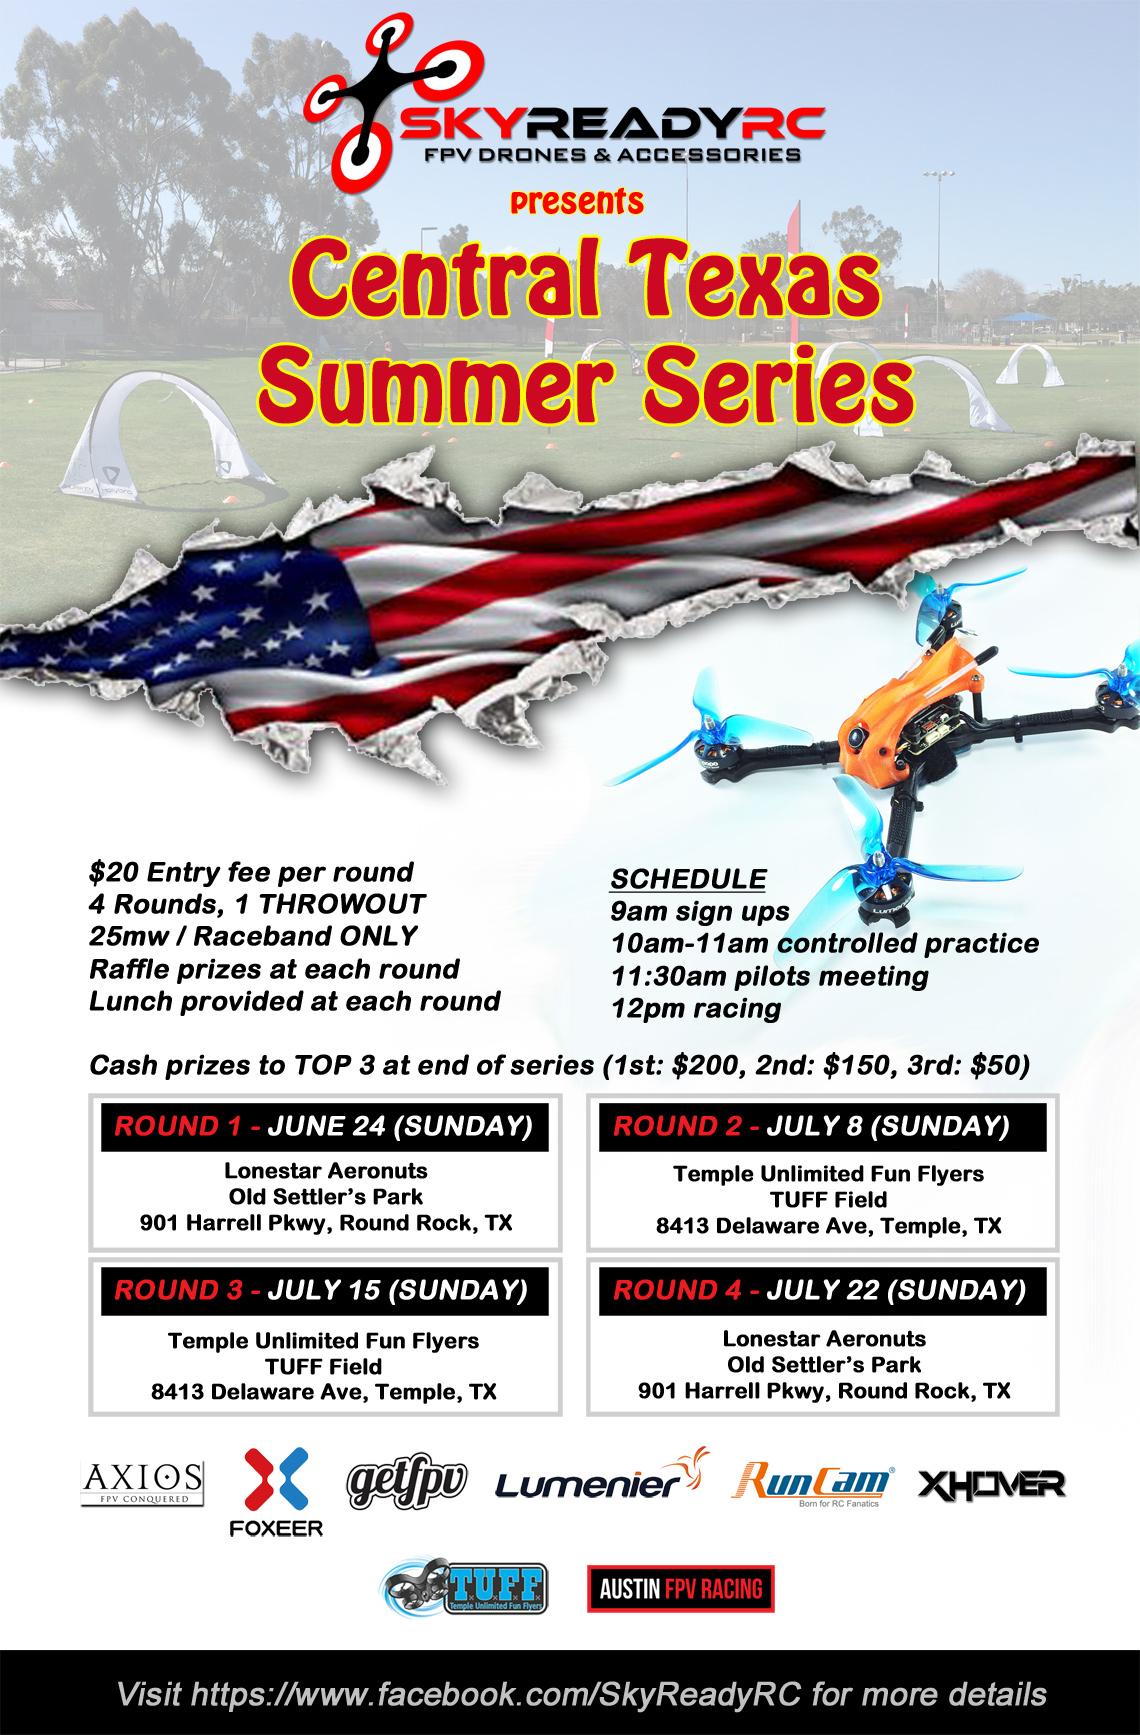 Central Texas Summer Series